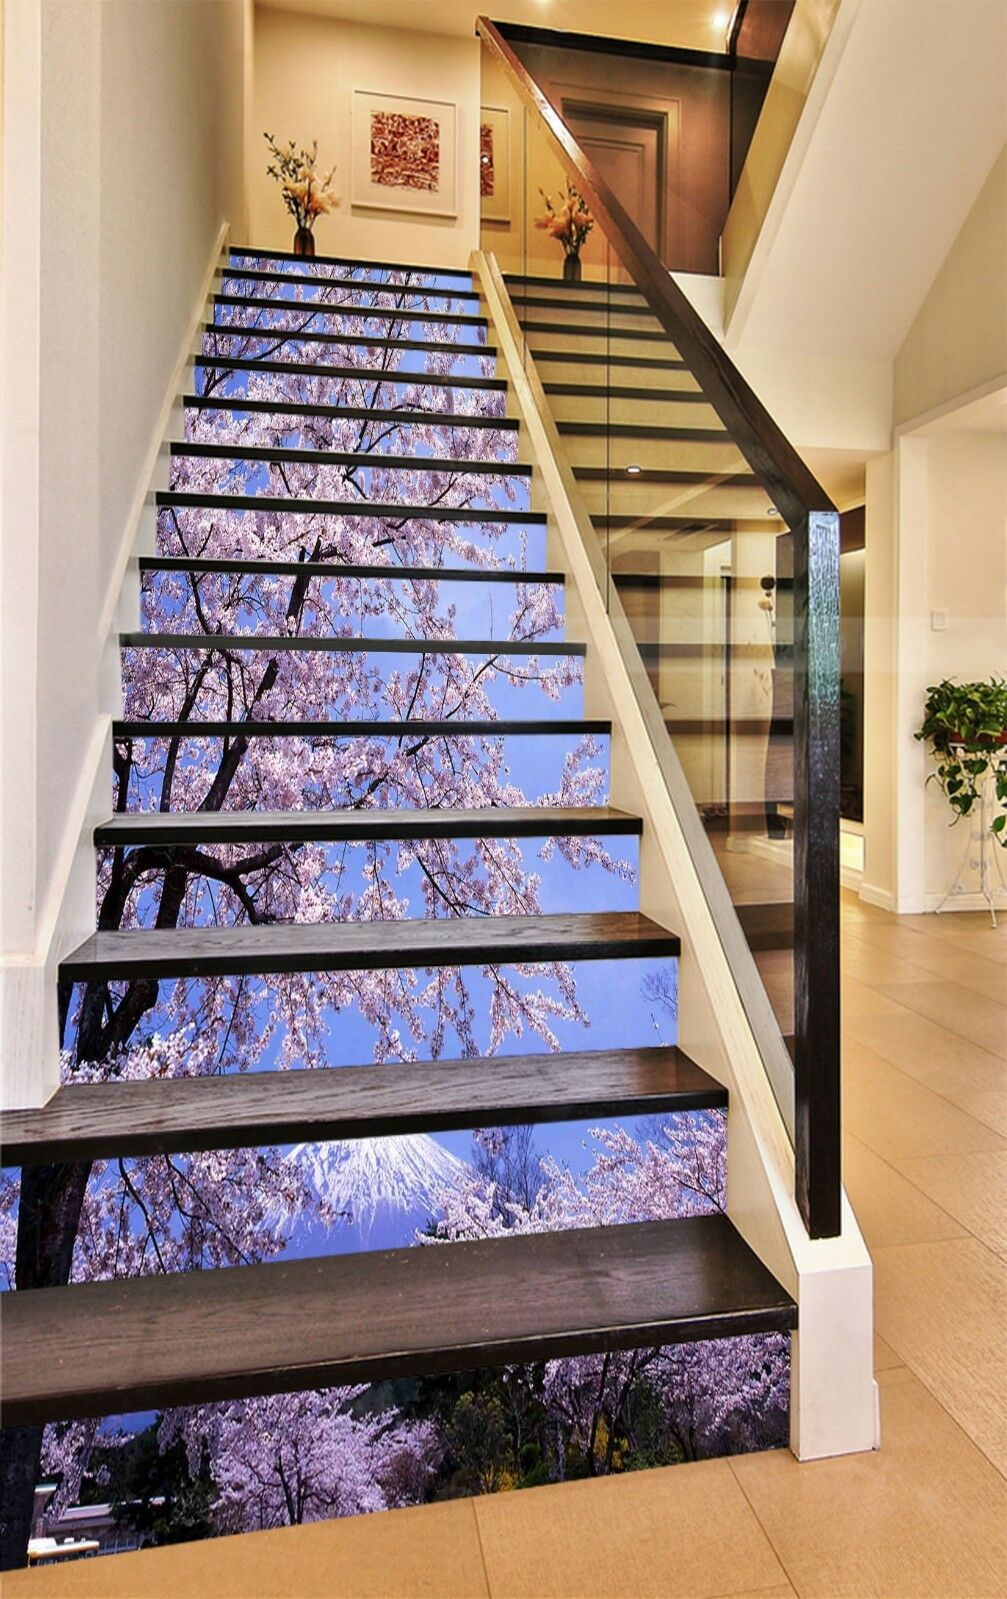 3D Squid Sky View Stair Risers Decoration Photo Mural Vinyl Decal Wallpaper CA